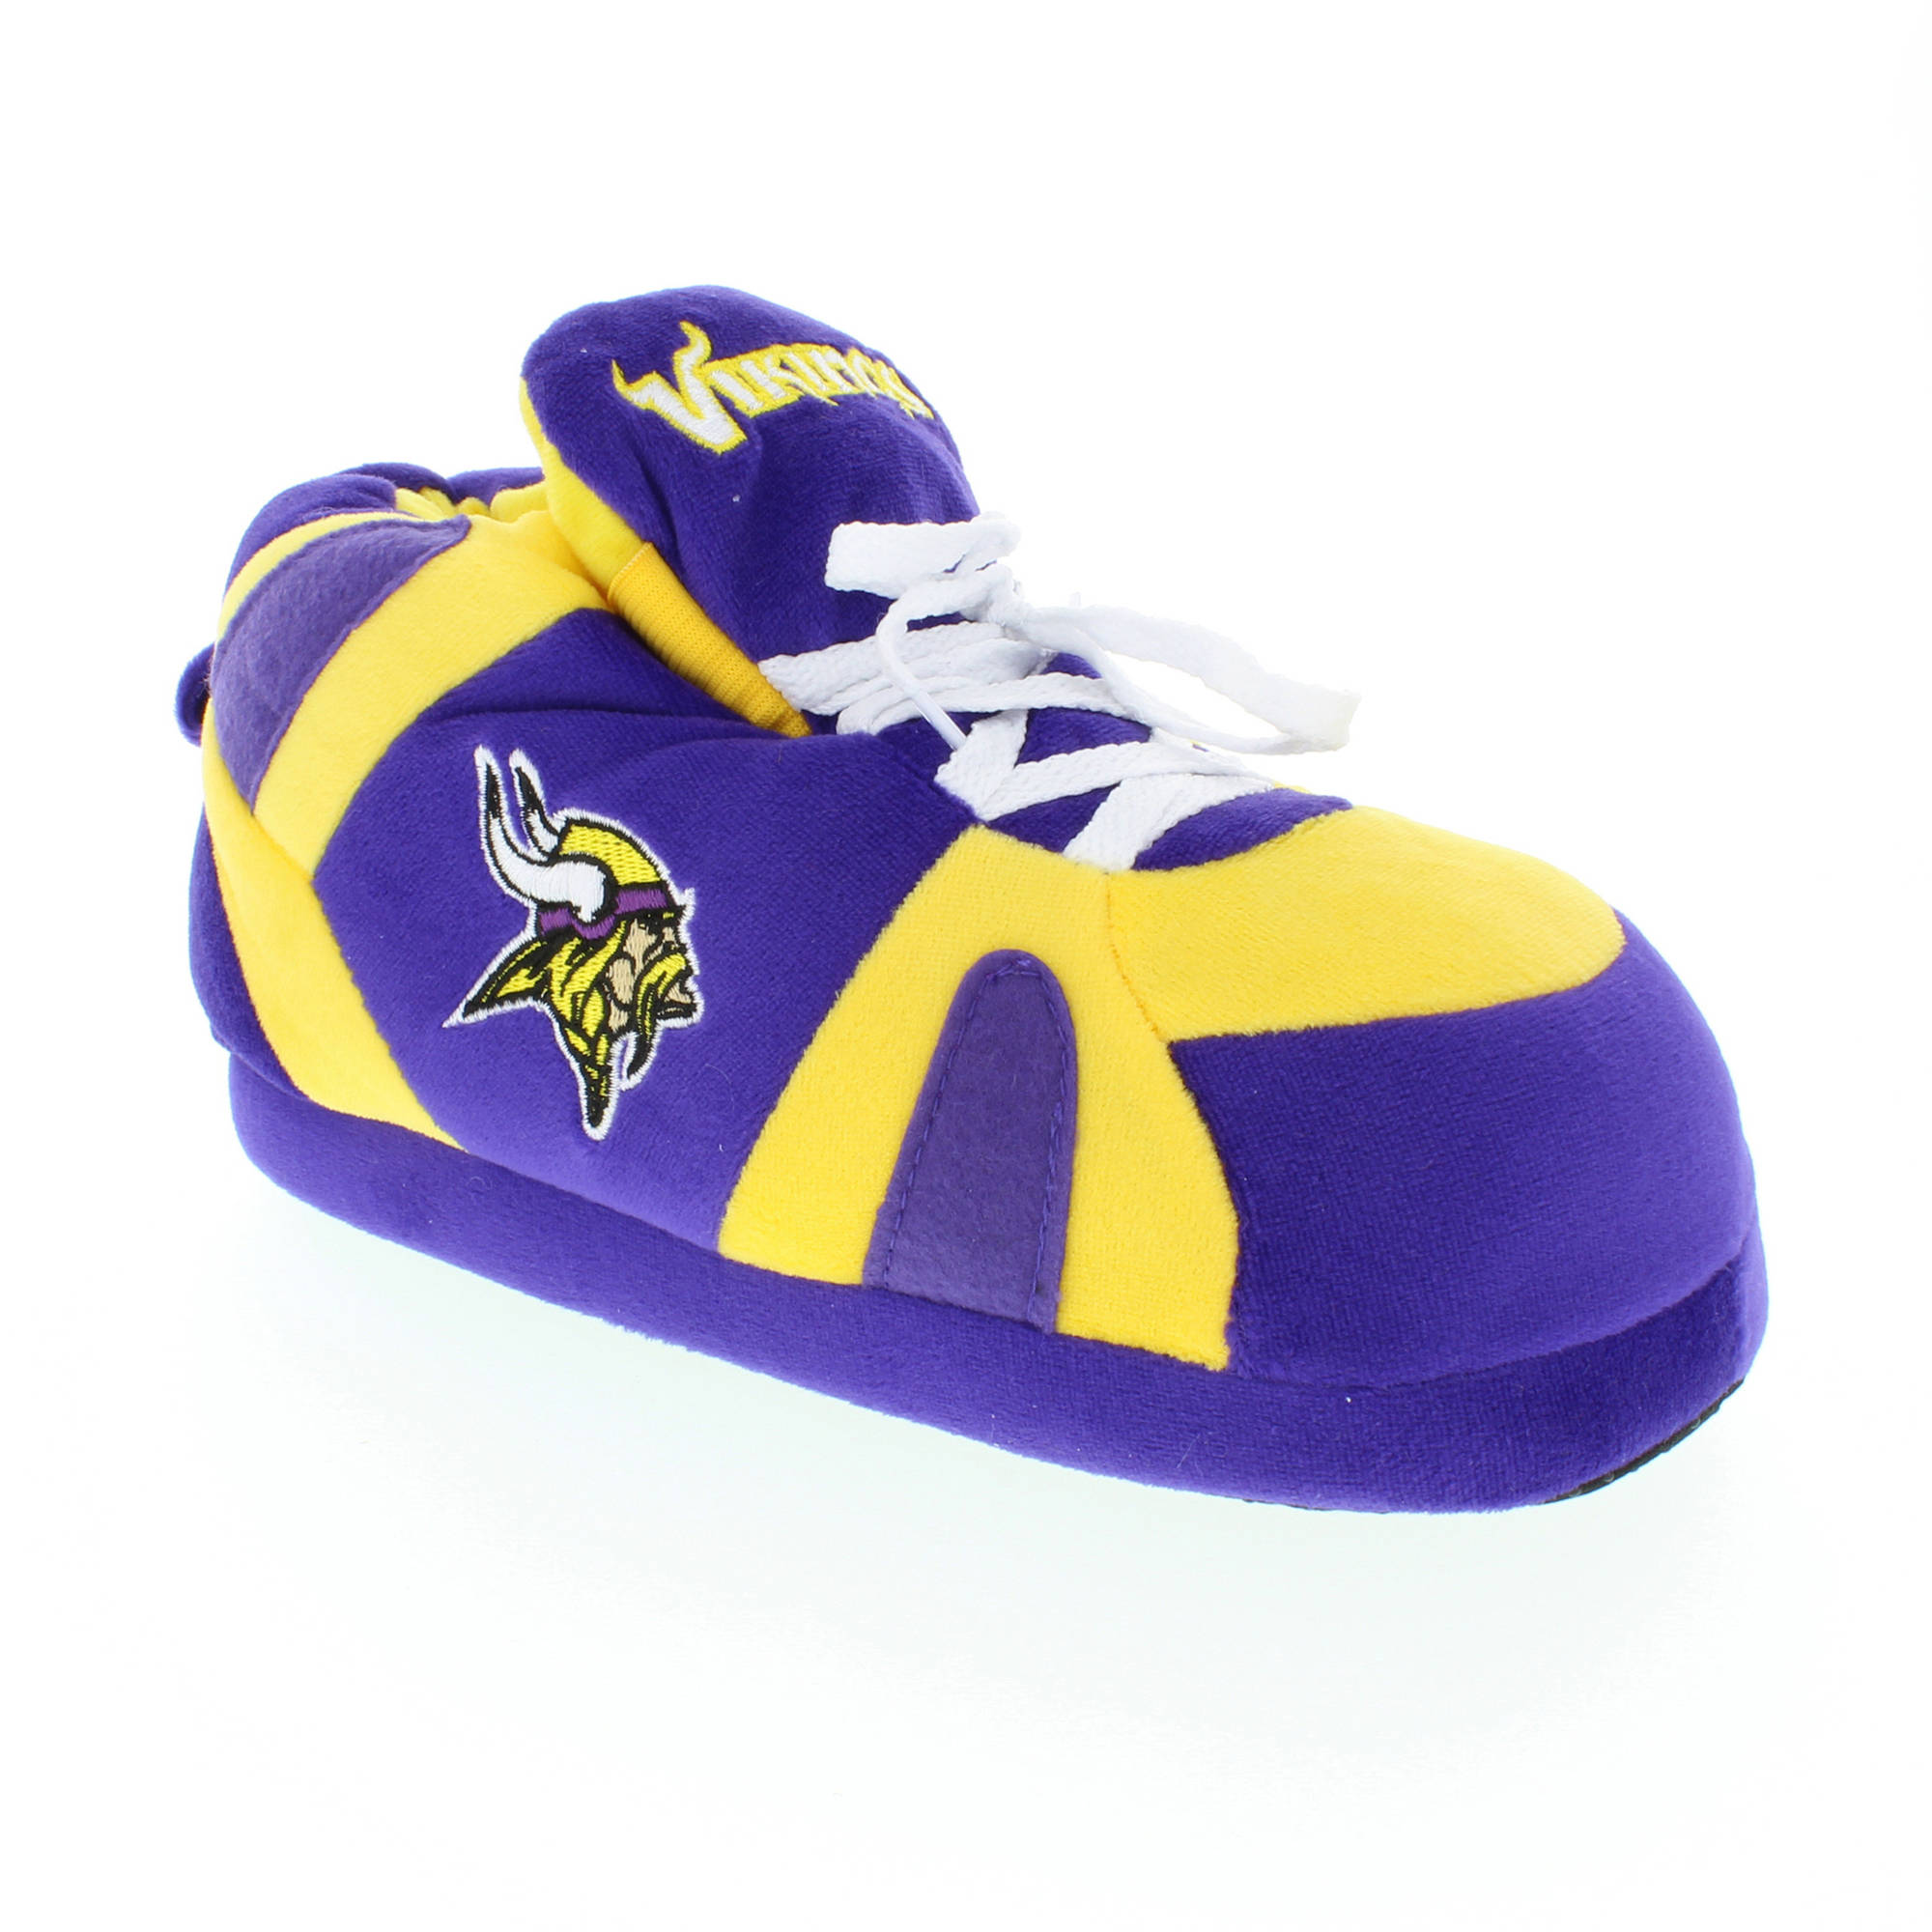 Comfy Feet - NFL Minnesota Vikings Slipper